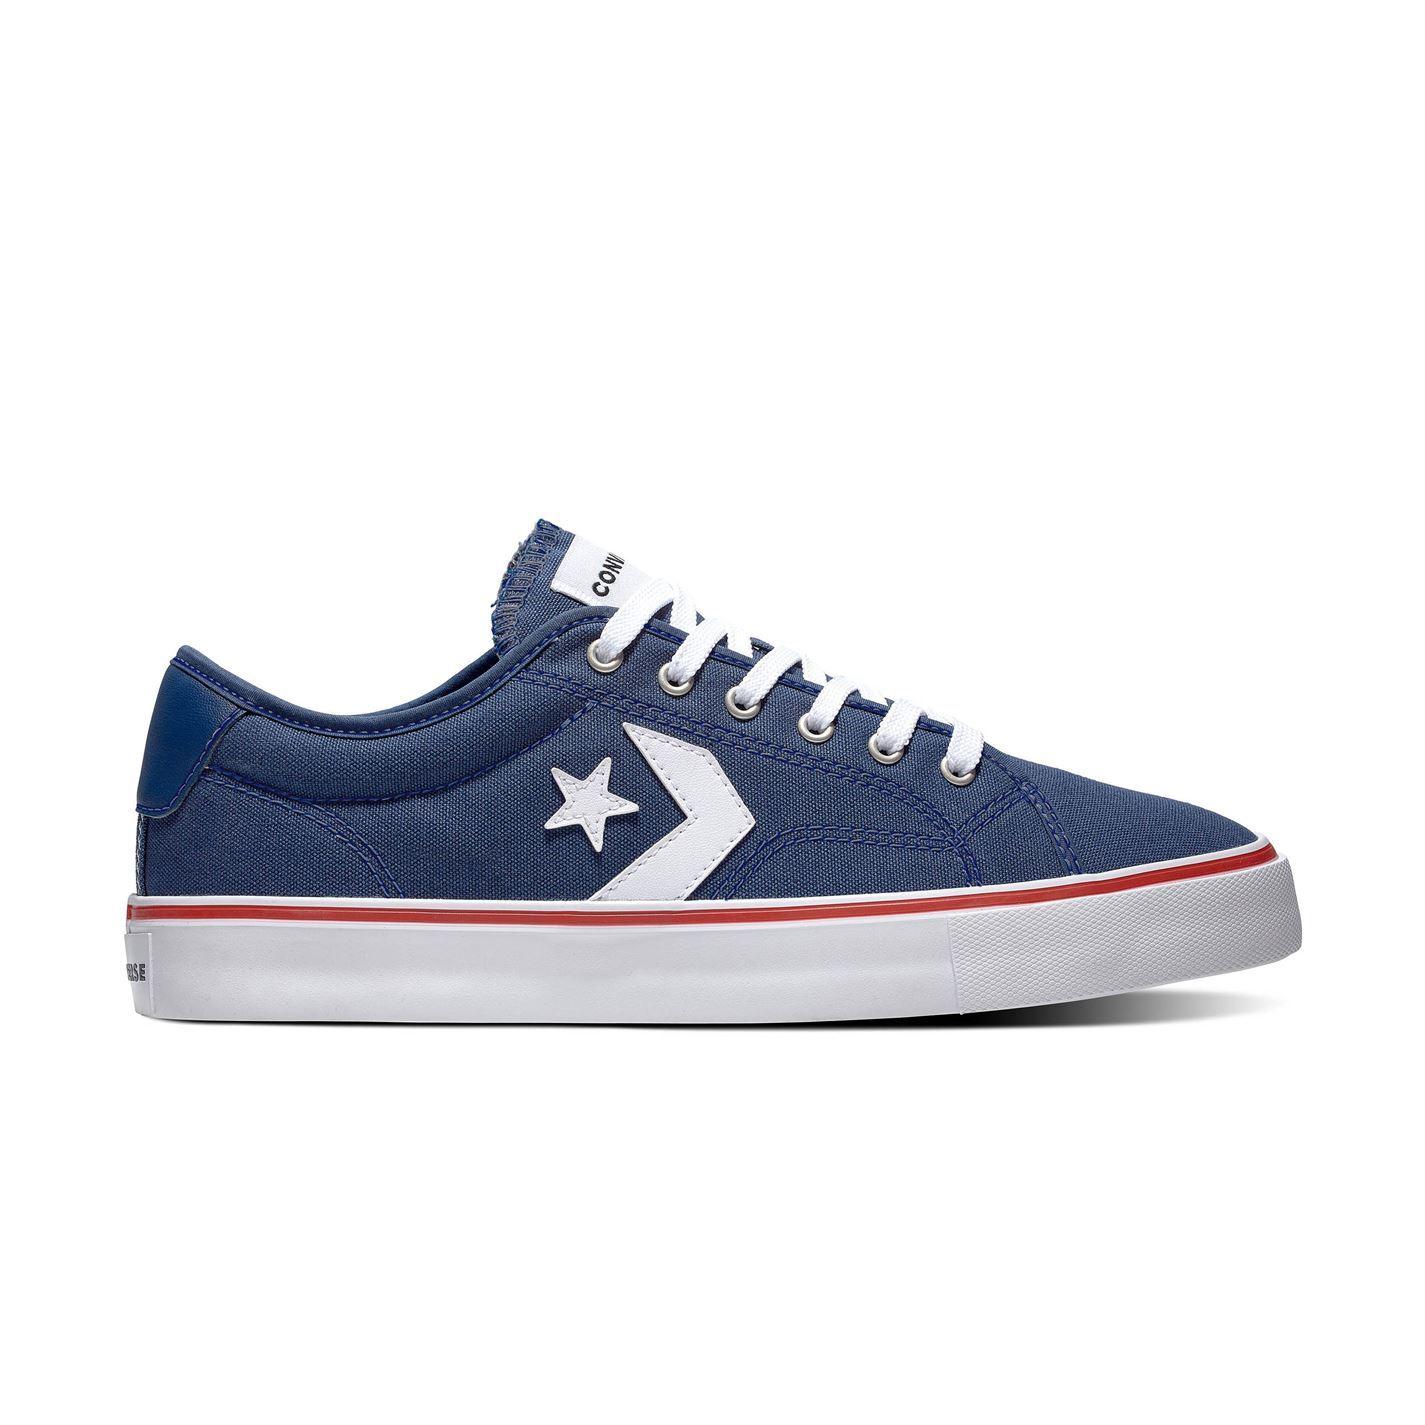 Converse-Ox-REPLAY-Baskets-Pour-Homme-Chaussures-De-Loisirs-Chaussures-Baskets miniature 13